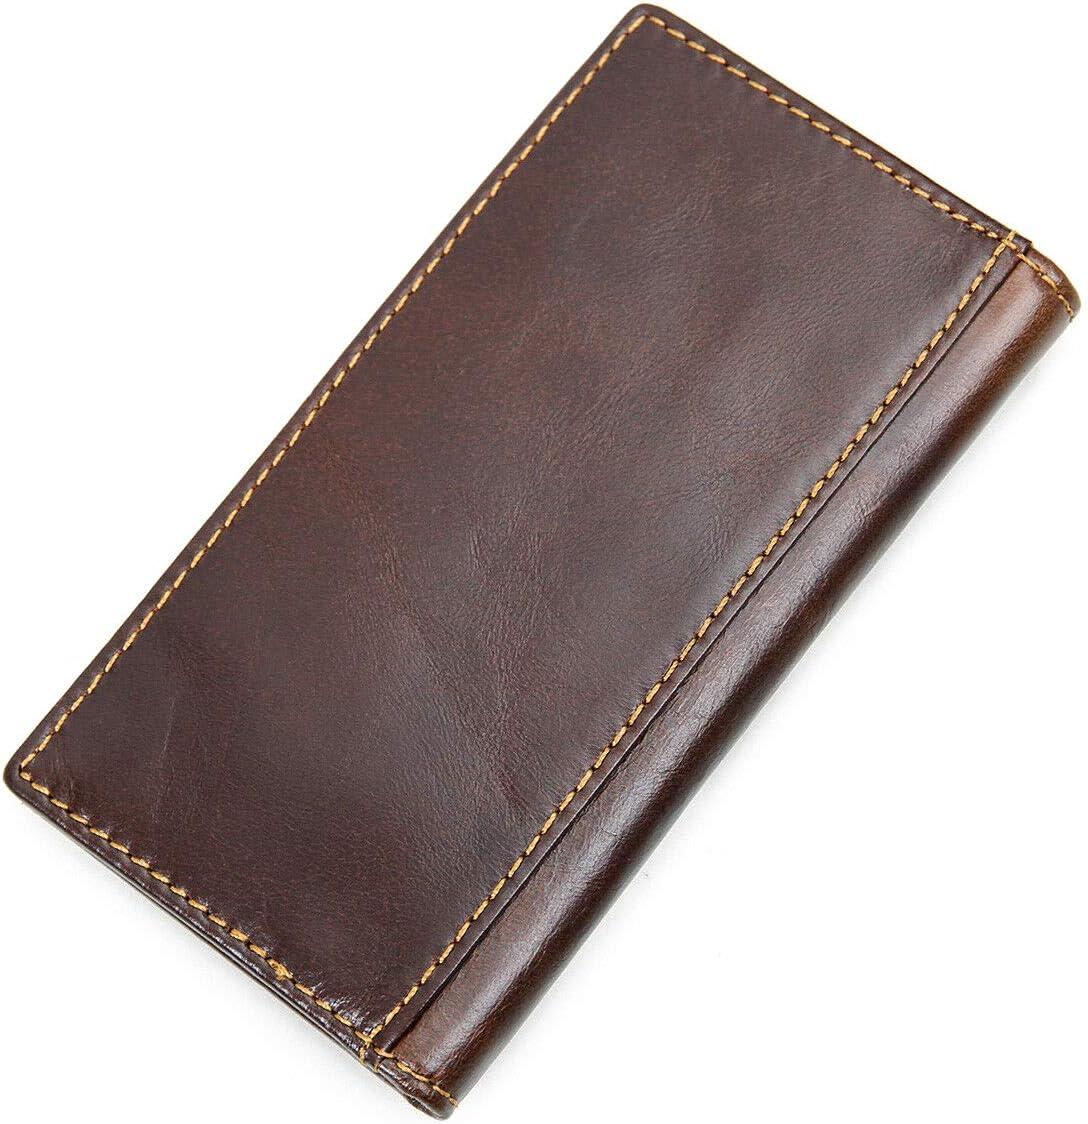 Men's Blocking Genuine Full Grain Leather Slim Clutch Wallet vet6112134